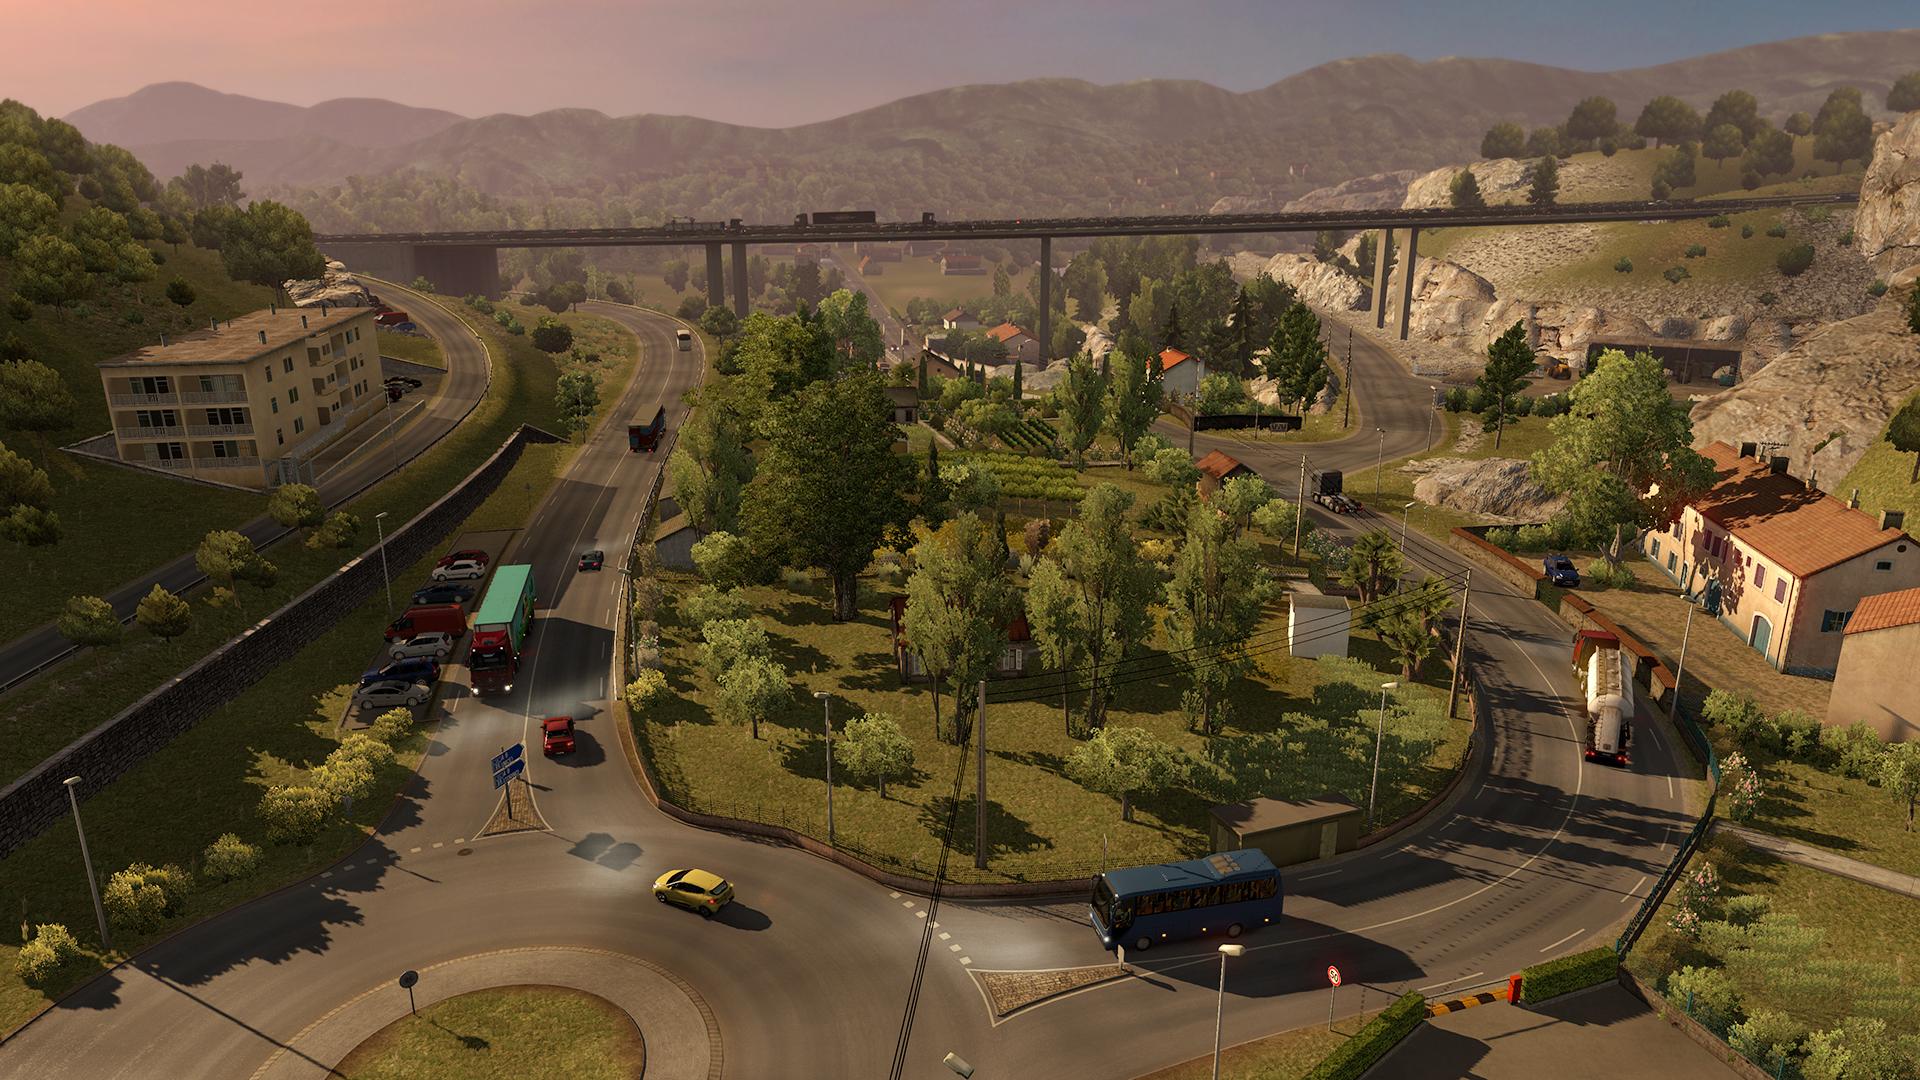 Euro Truck Simulator 2 - Vive la France ! · AppID: 531130